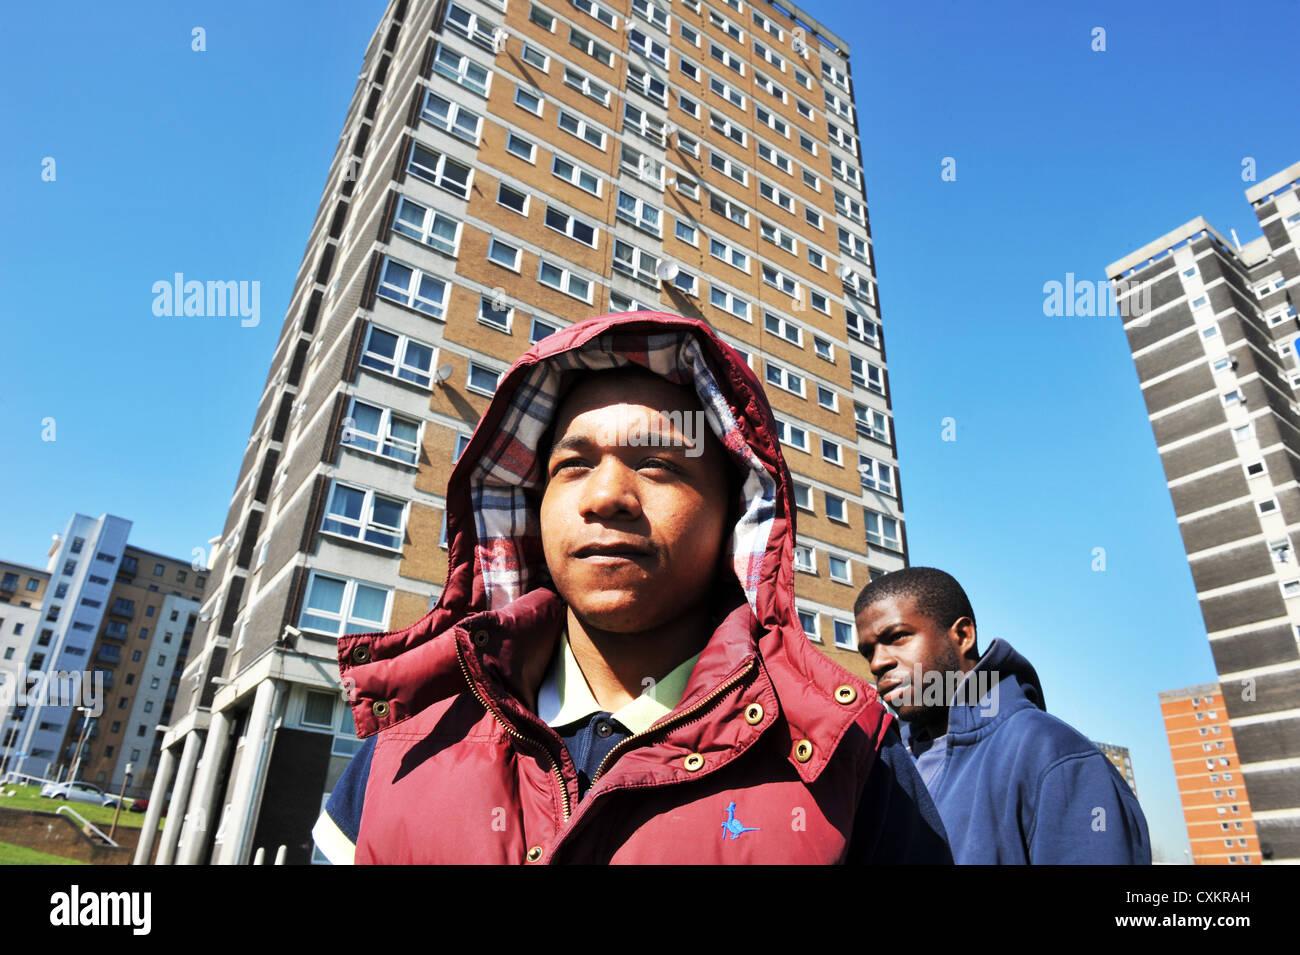 Les jeunes Les jeunes chômeurs Leeds UK Photo Stock